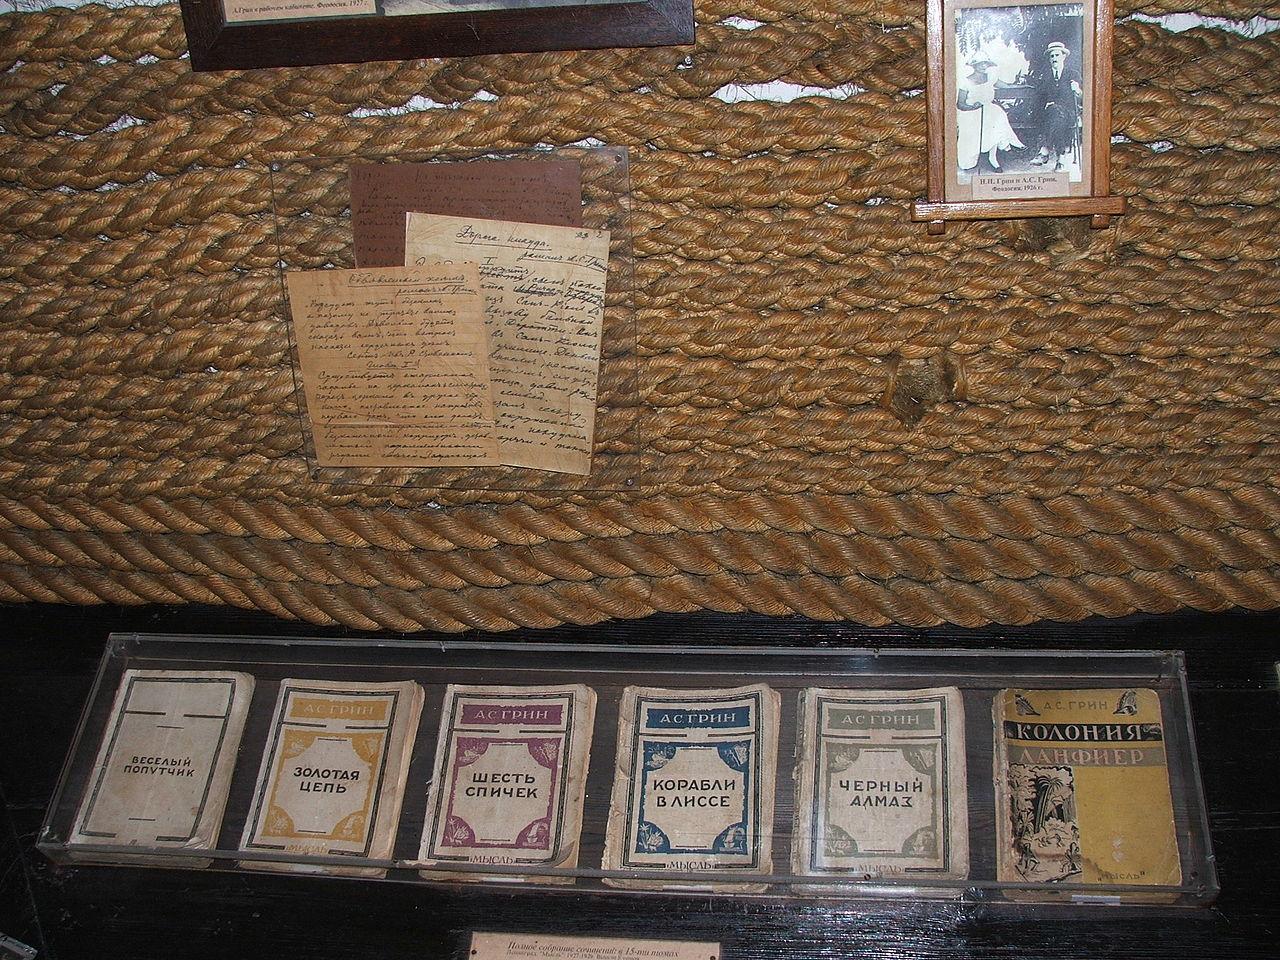 Музей Александра Грина, книги писателя